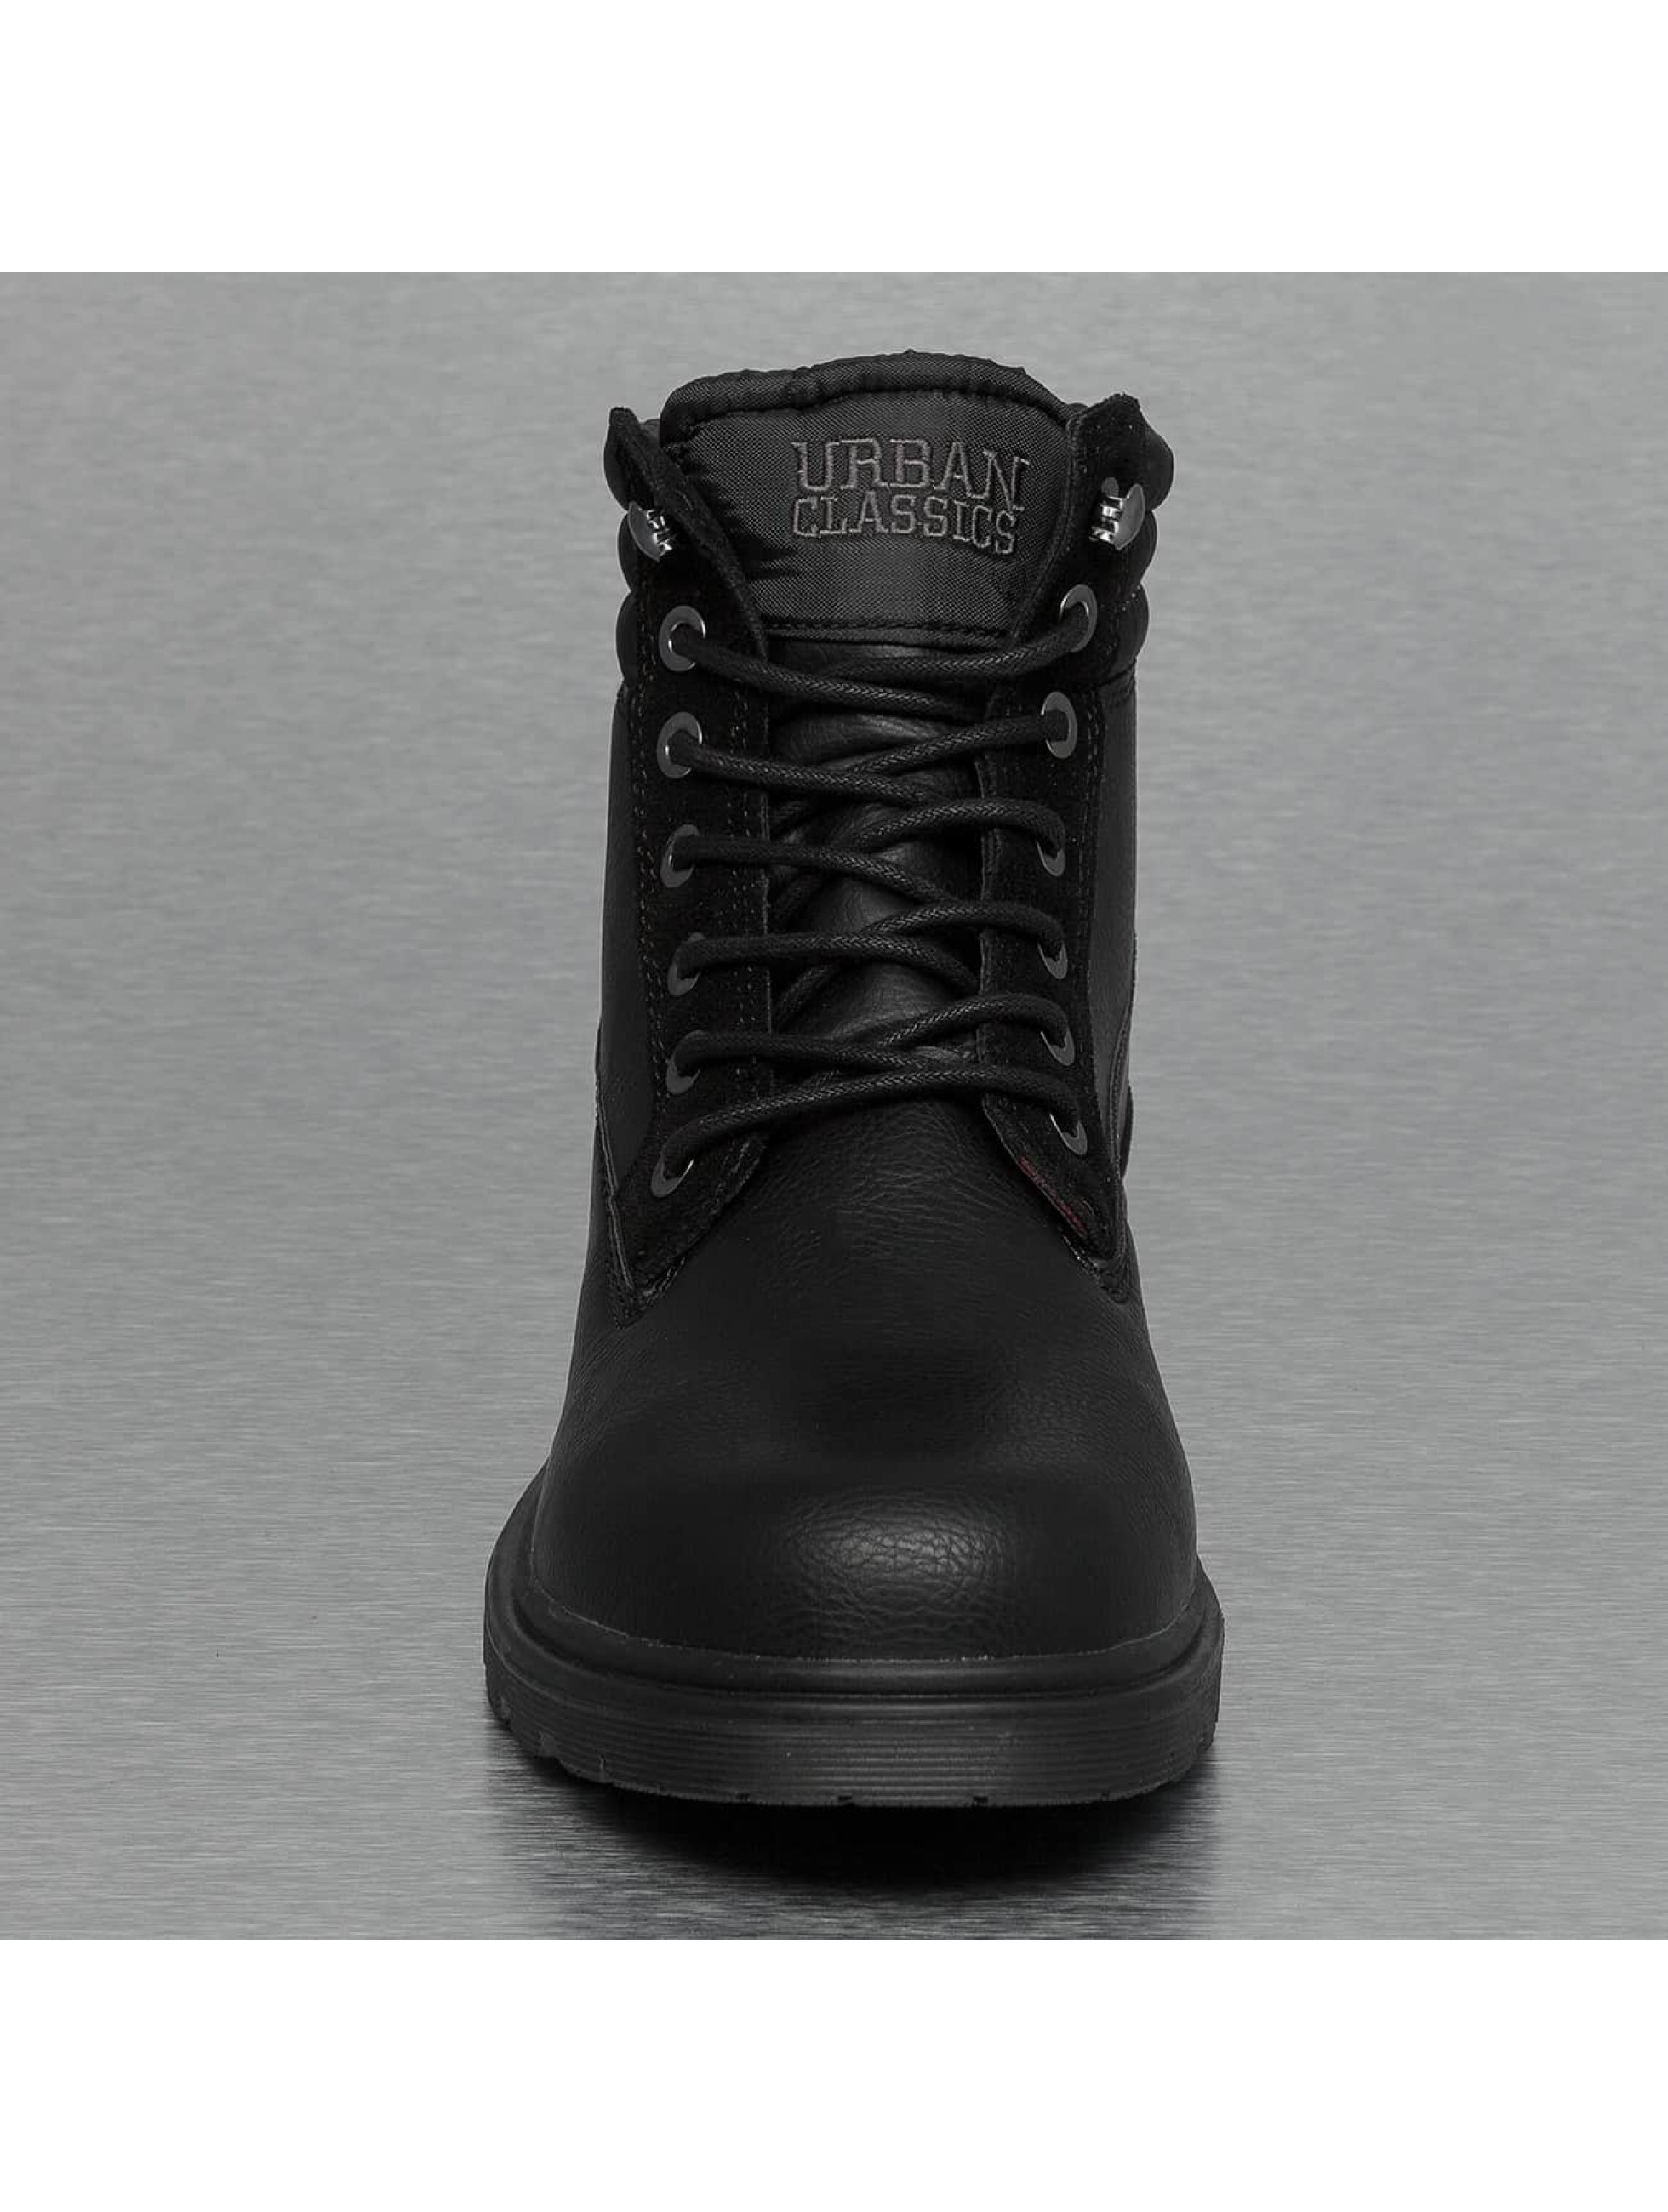 Urban Classics Chaussures montantes Winter noir